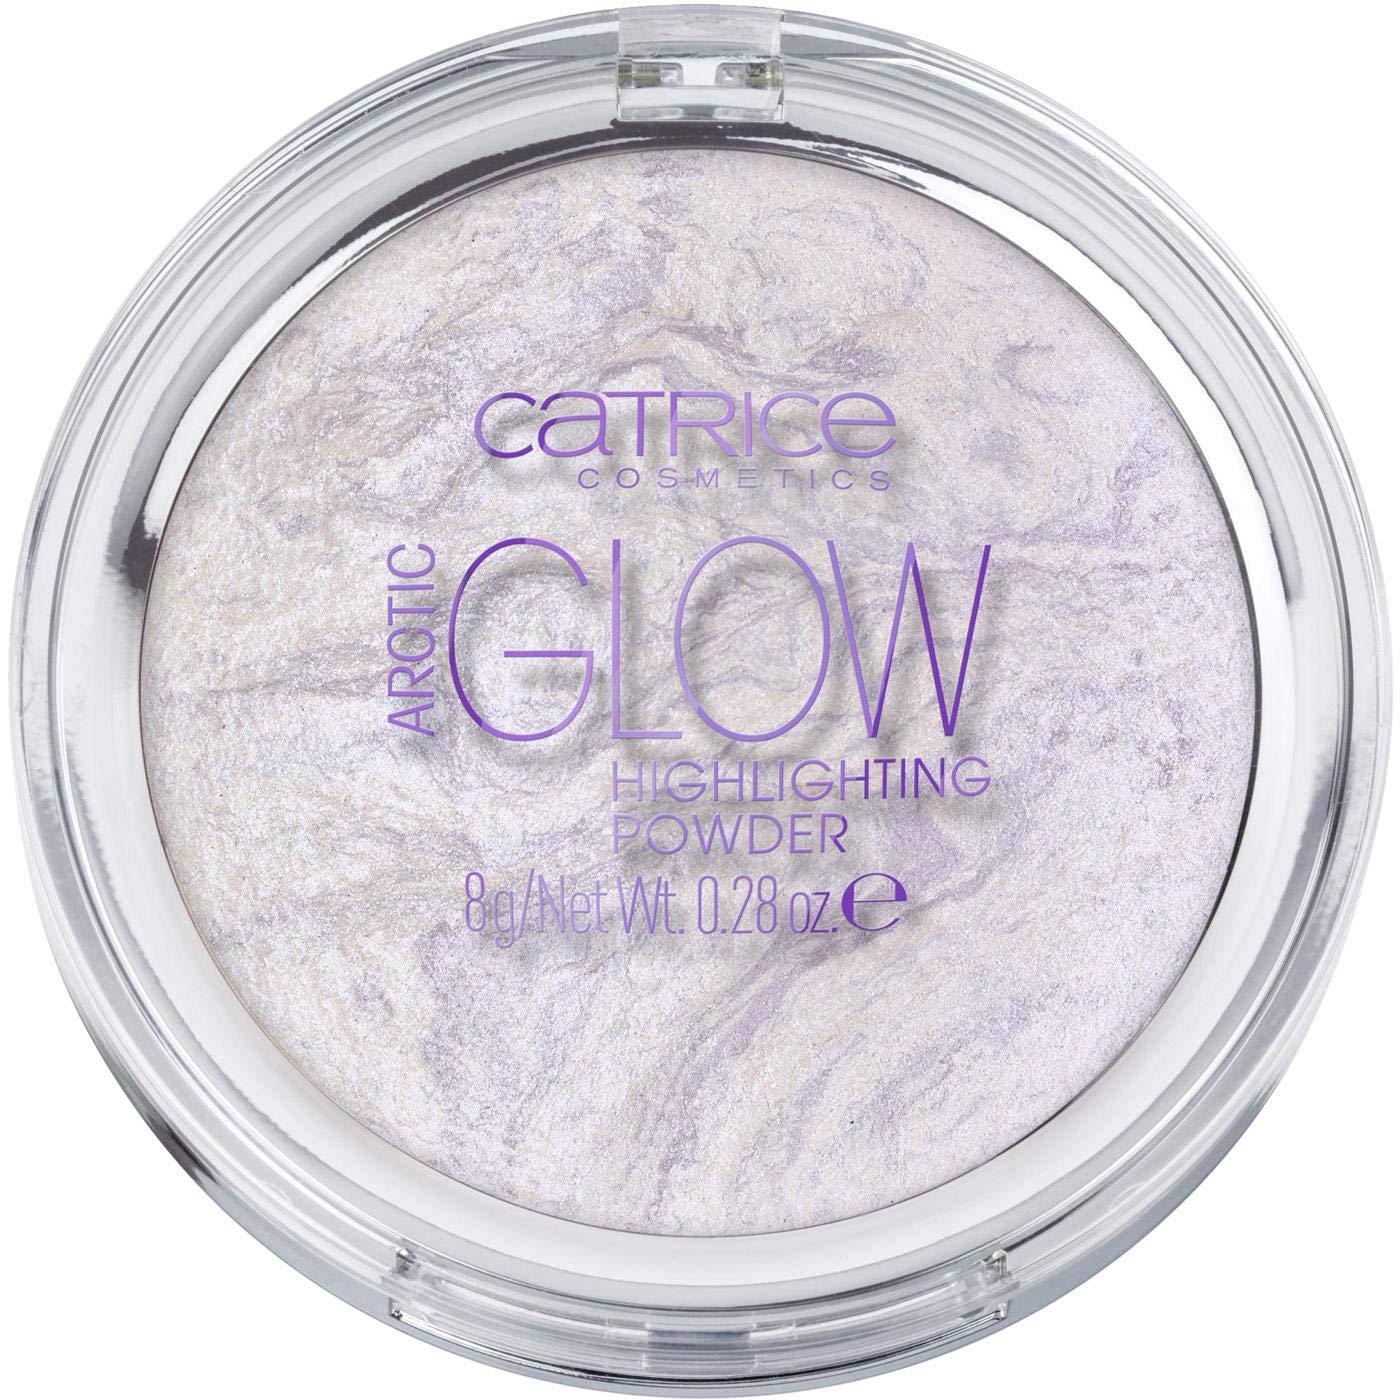 Catrice Teint Highlighter Arctic Glow Highlighting Powder Nr. 010 Jupiter's Glow 8 g